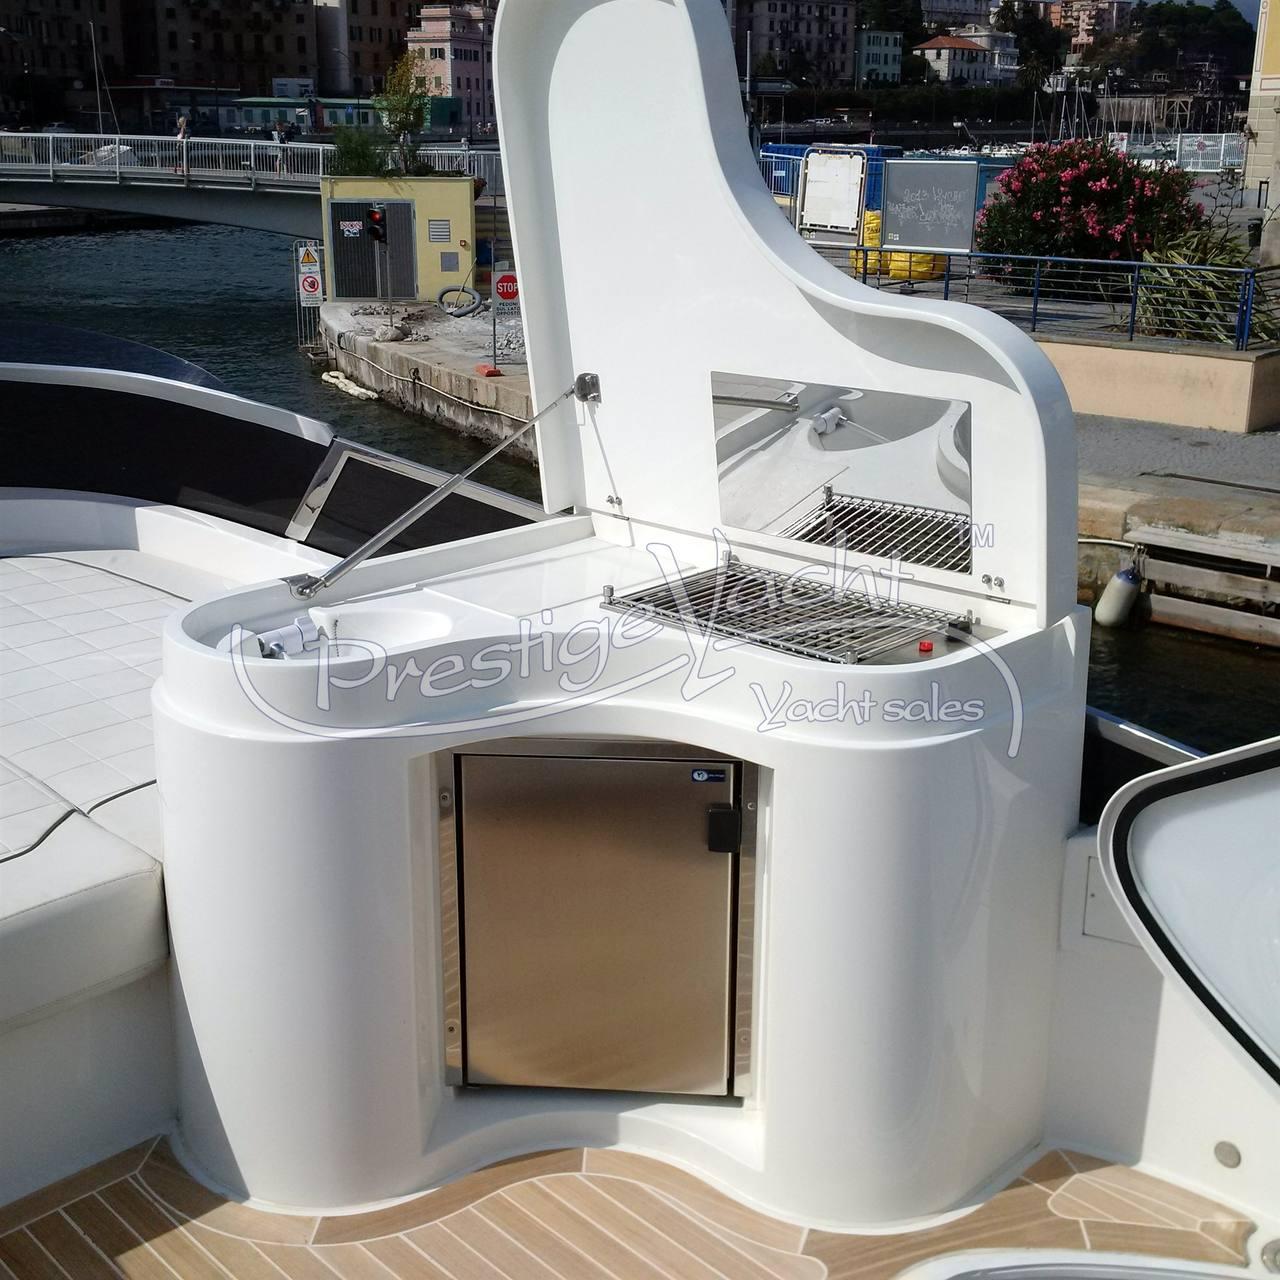 Enterprise marine Em 600